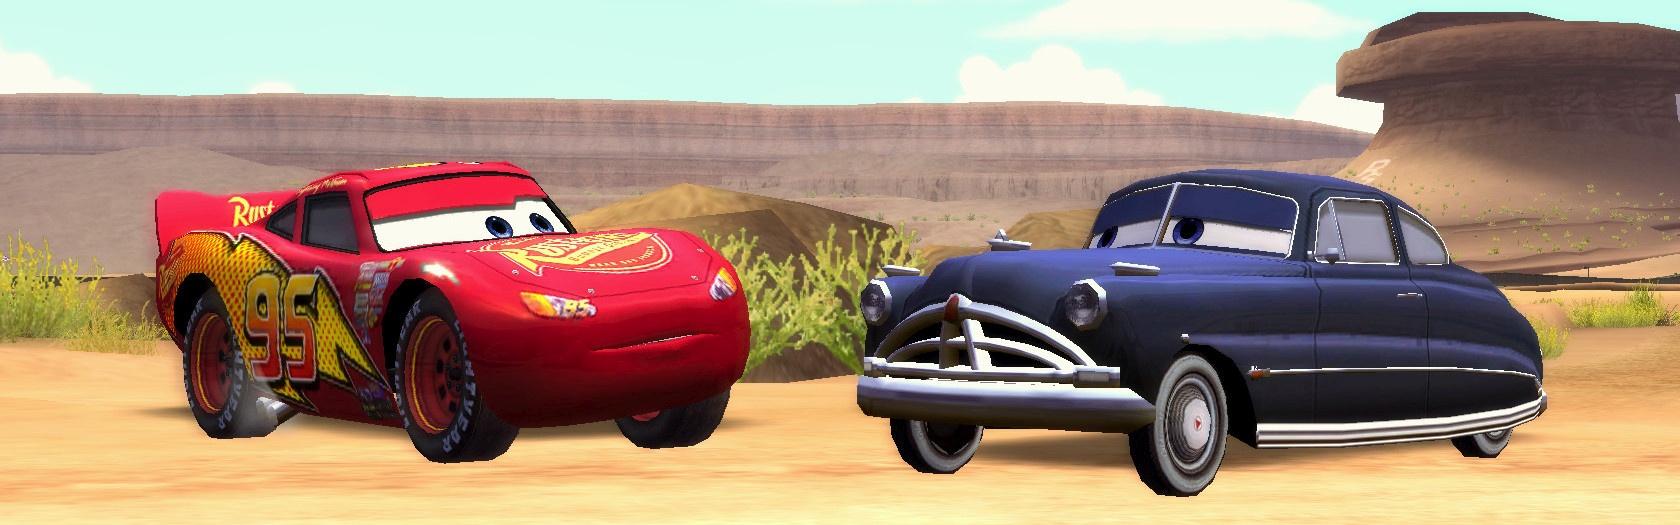 Disney Pixar Cars: Mater-National Championship Steam Key GLOBAL